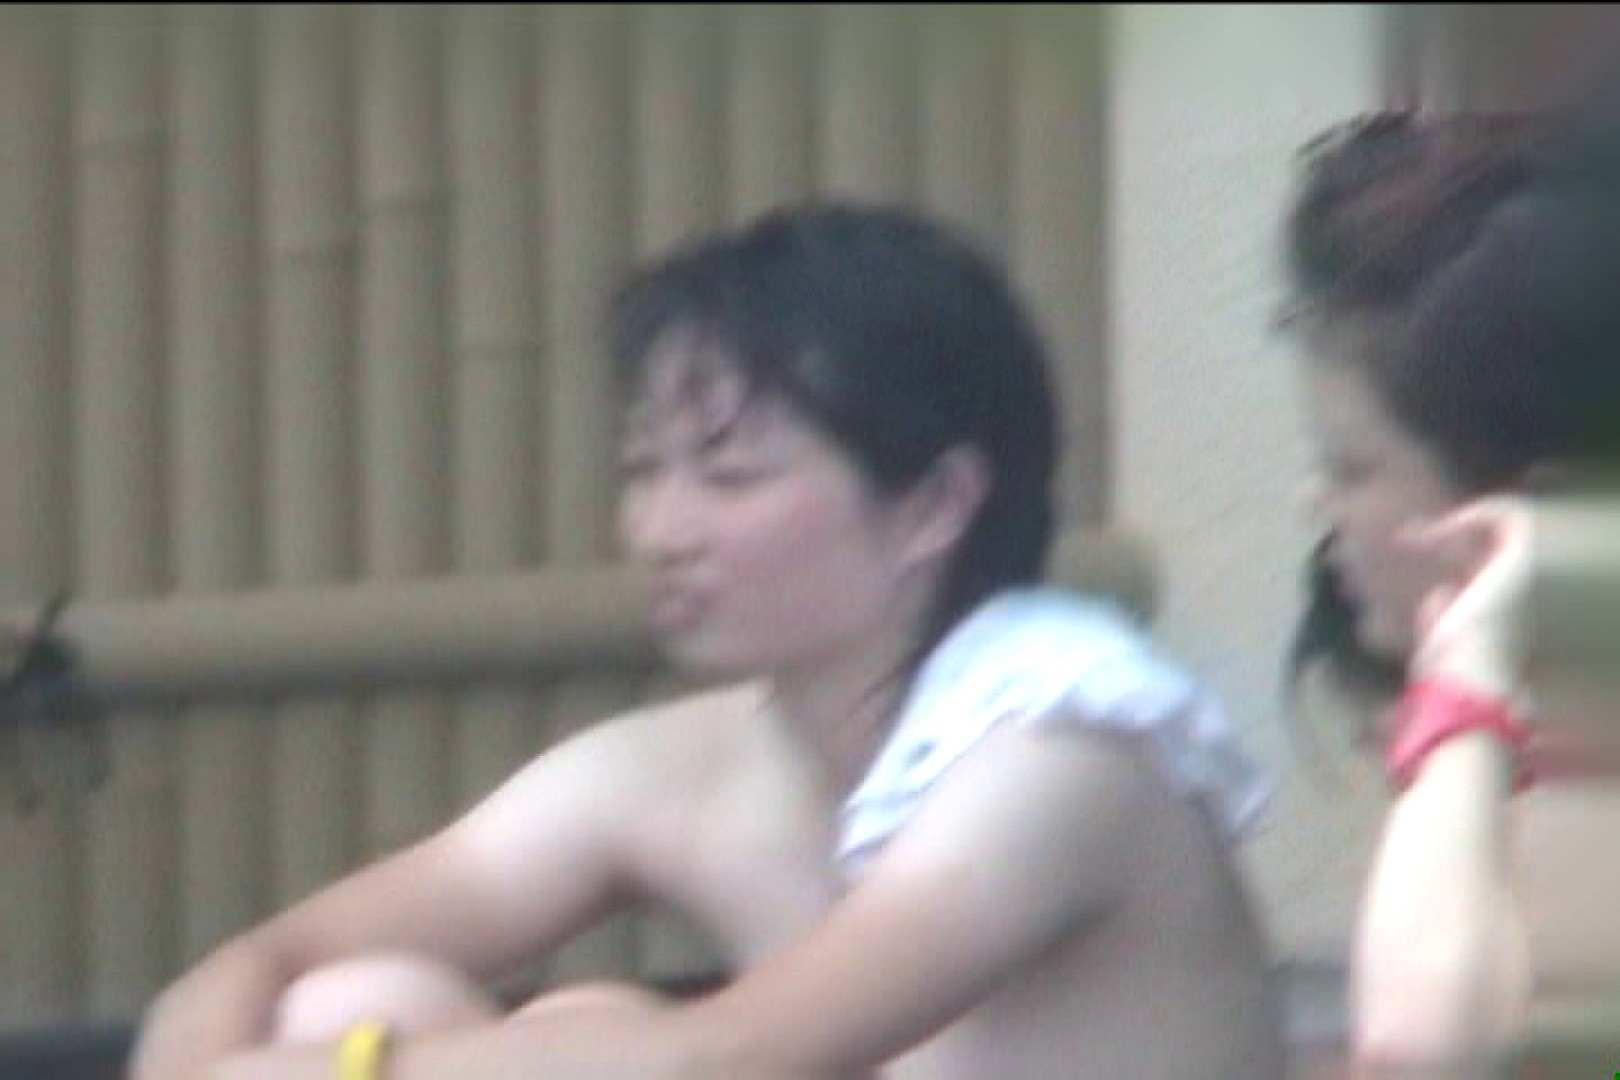 Aquaな露天風呂Vol.94【VIP限定】 OLセックス 盗撮エロ画像 79画像 32